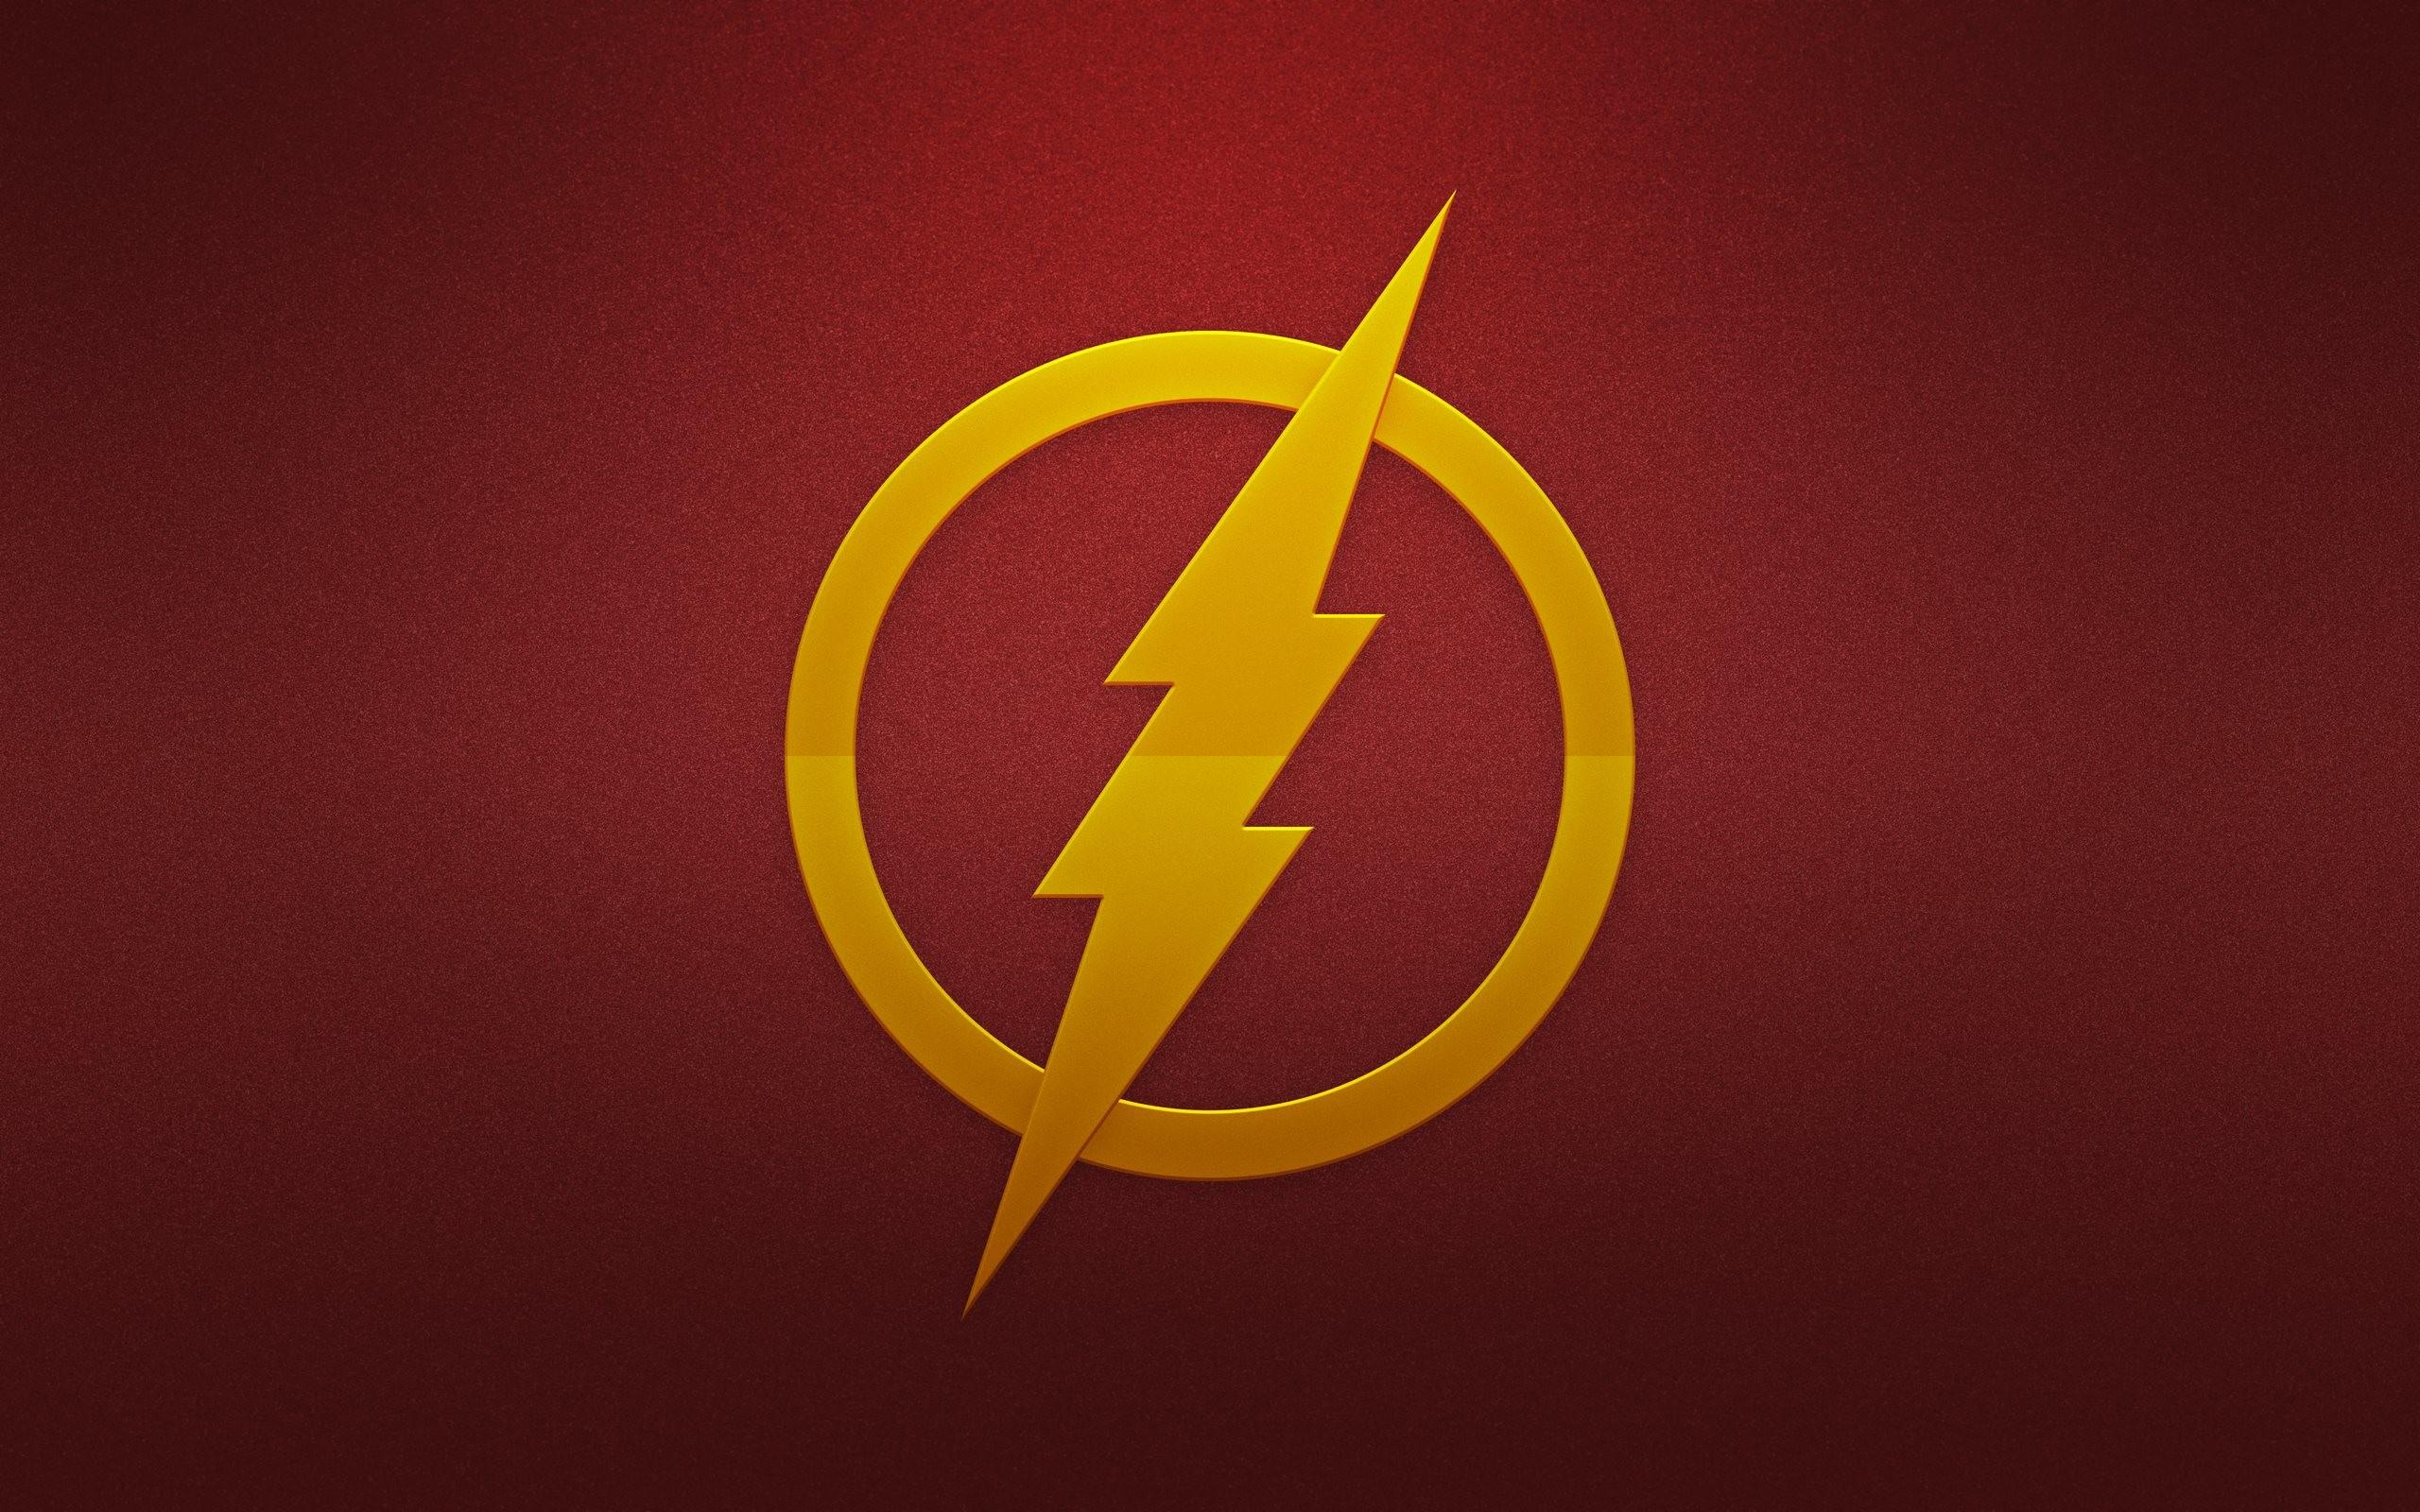 3840x1080 Arrow And Flash HD Wallpaper